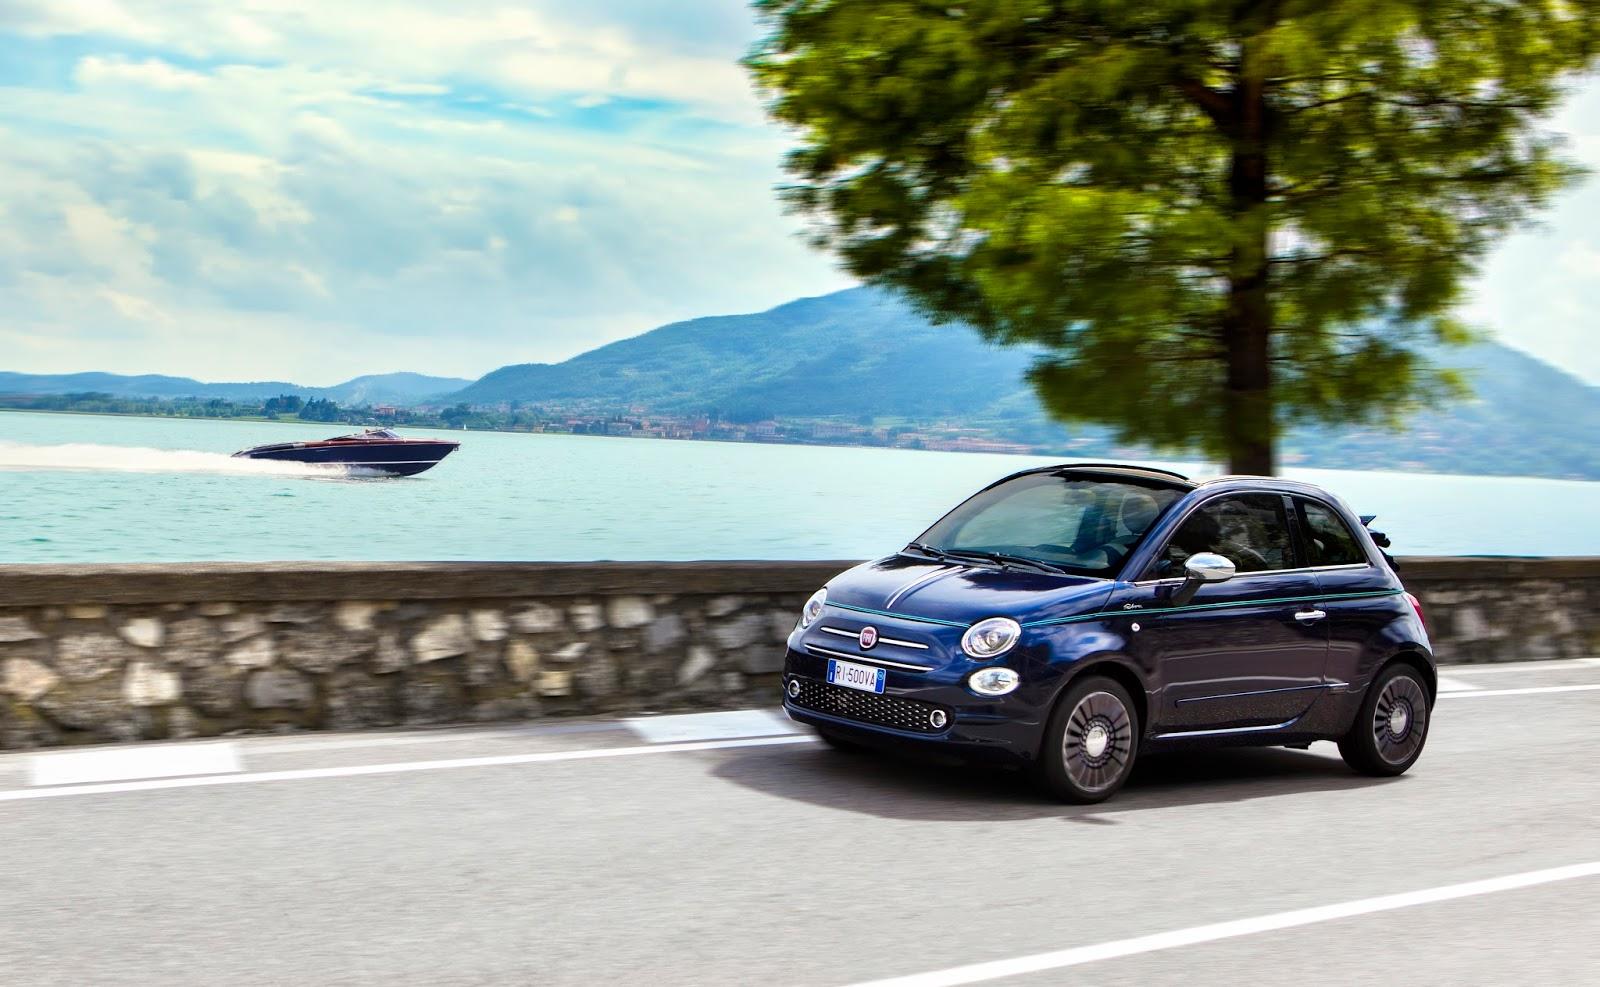 160627 Fiat 500 Riva 10 Fiat 500 Riva : Το κομψό έγινε και πολυτελές Fiat, Fiat 500, Fiat 500 Riva, Fiat 500C, Riva, supermini, videos